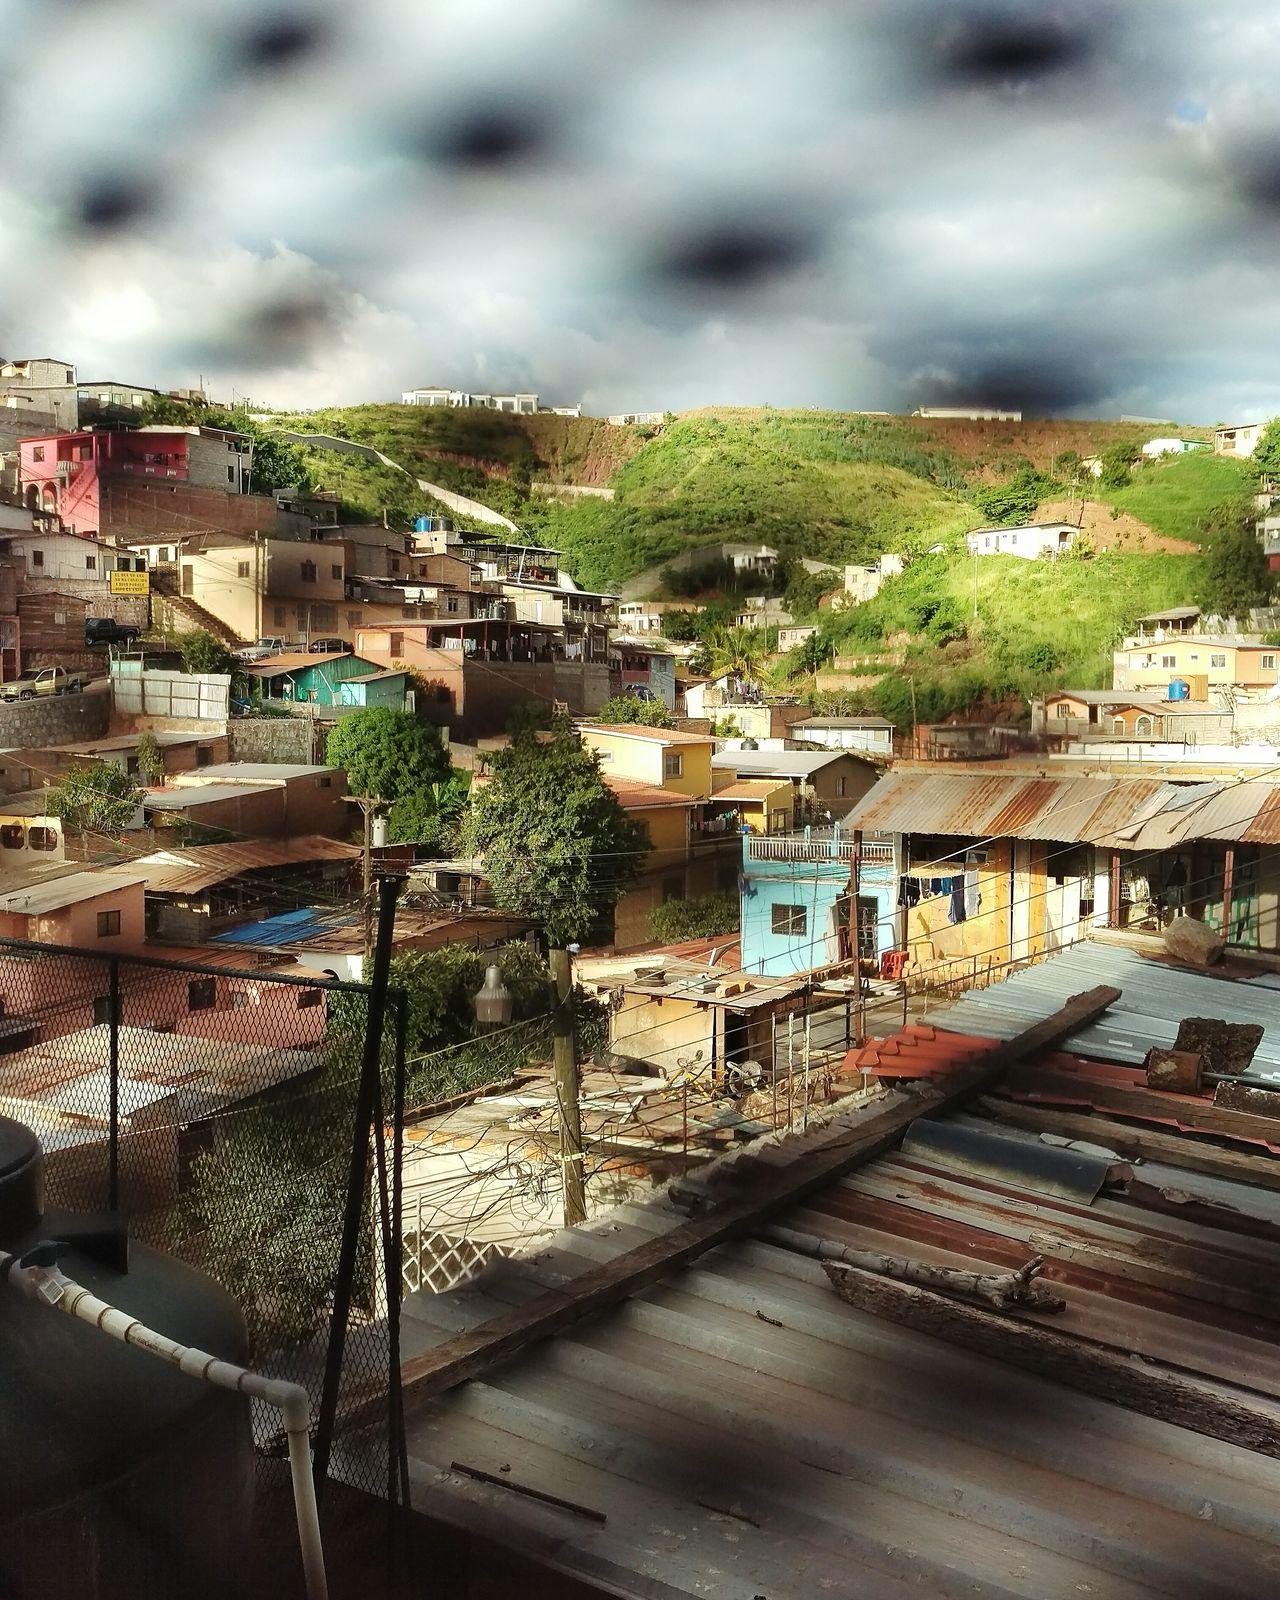 Honduras ♥ Tegucigalpa Transportation No People Sky Rail Transportation Built Structure Outdoors Architecture Day Tree Nature dangerous Dangerous